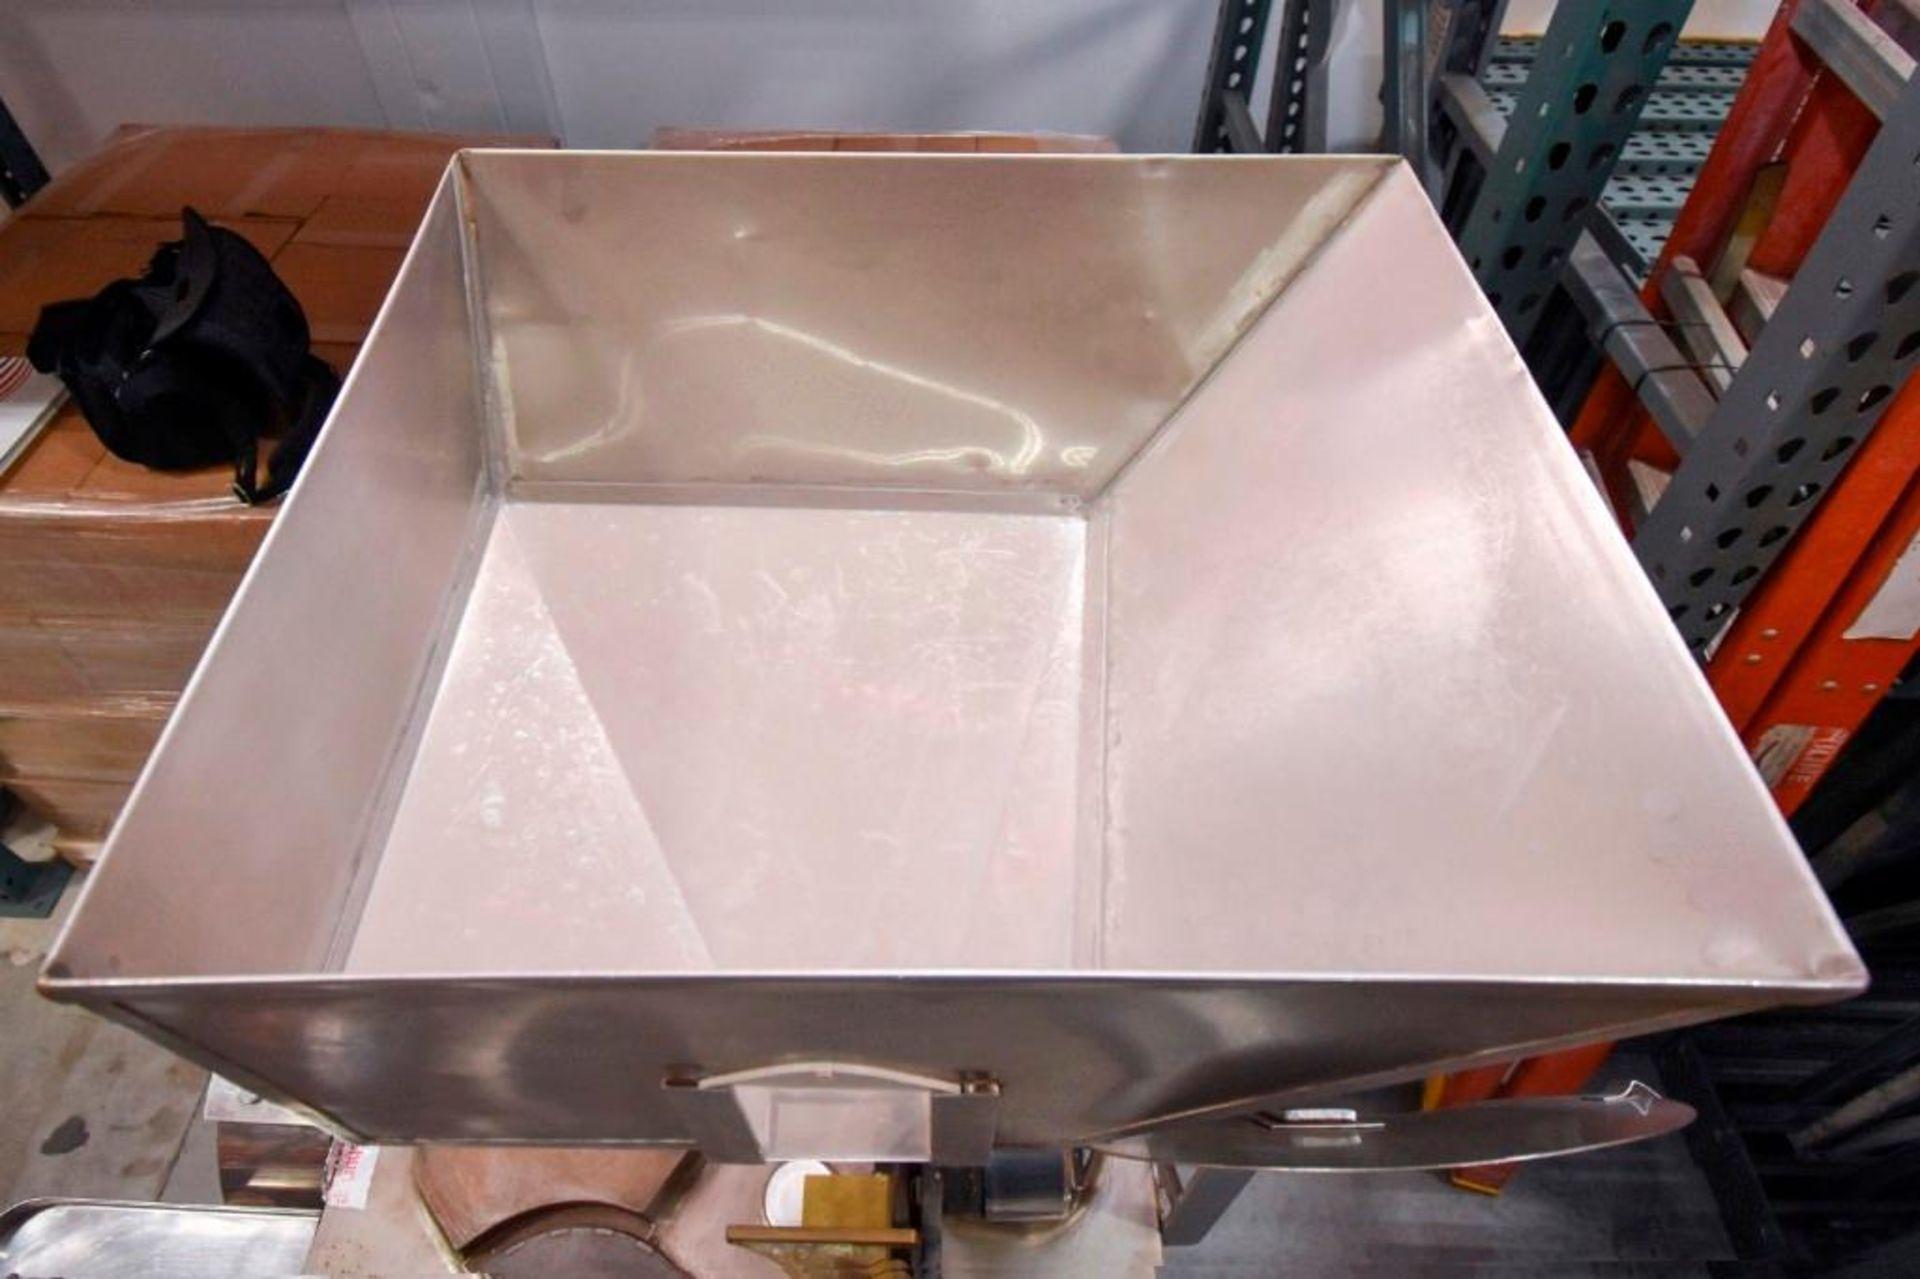 Semi-Automatic Encapsulator MDL 8S - Image 14 of 20